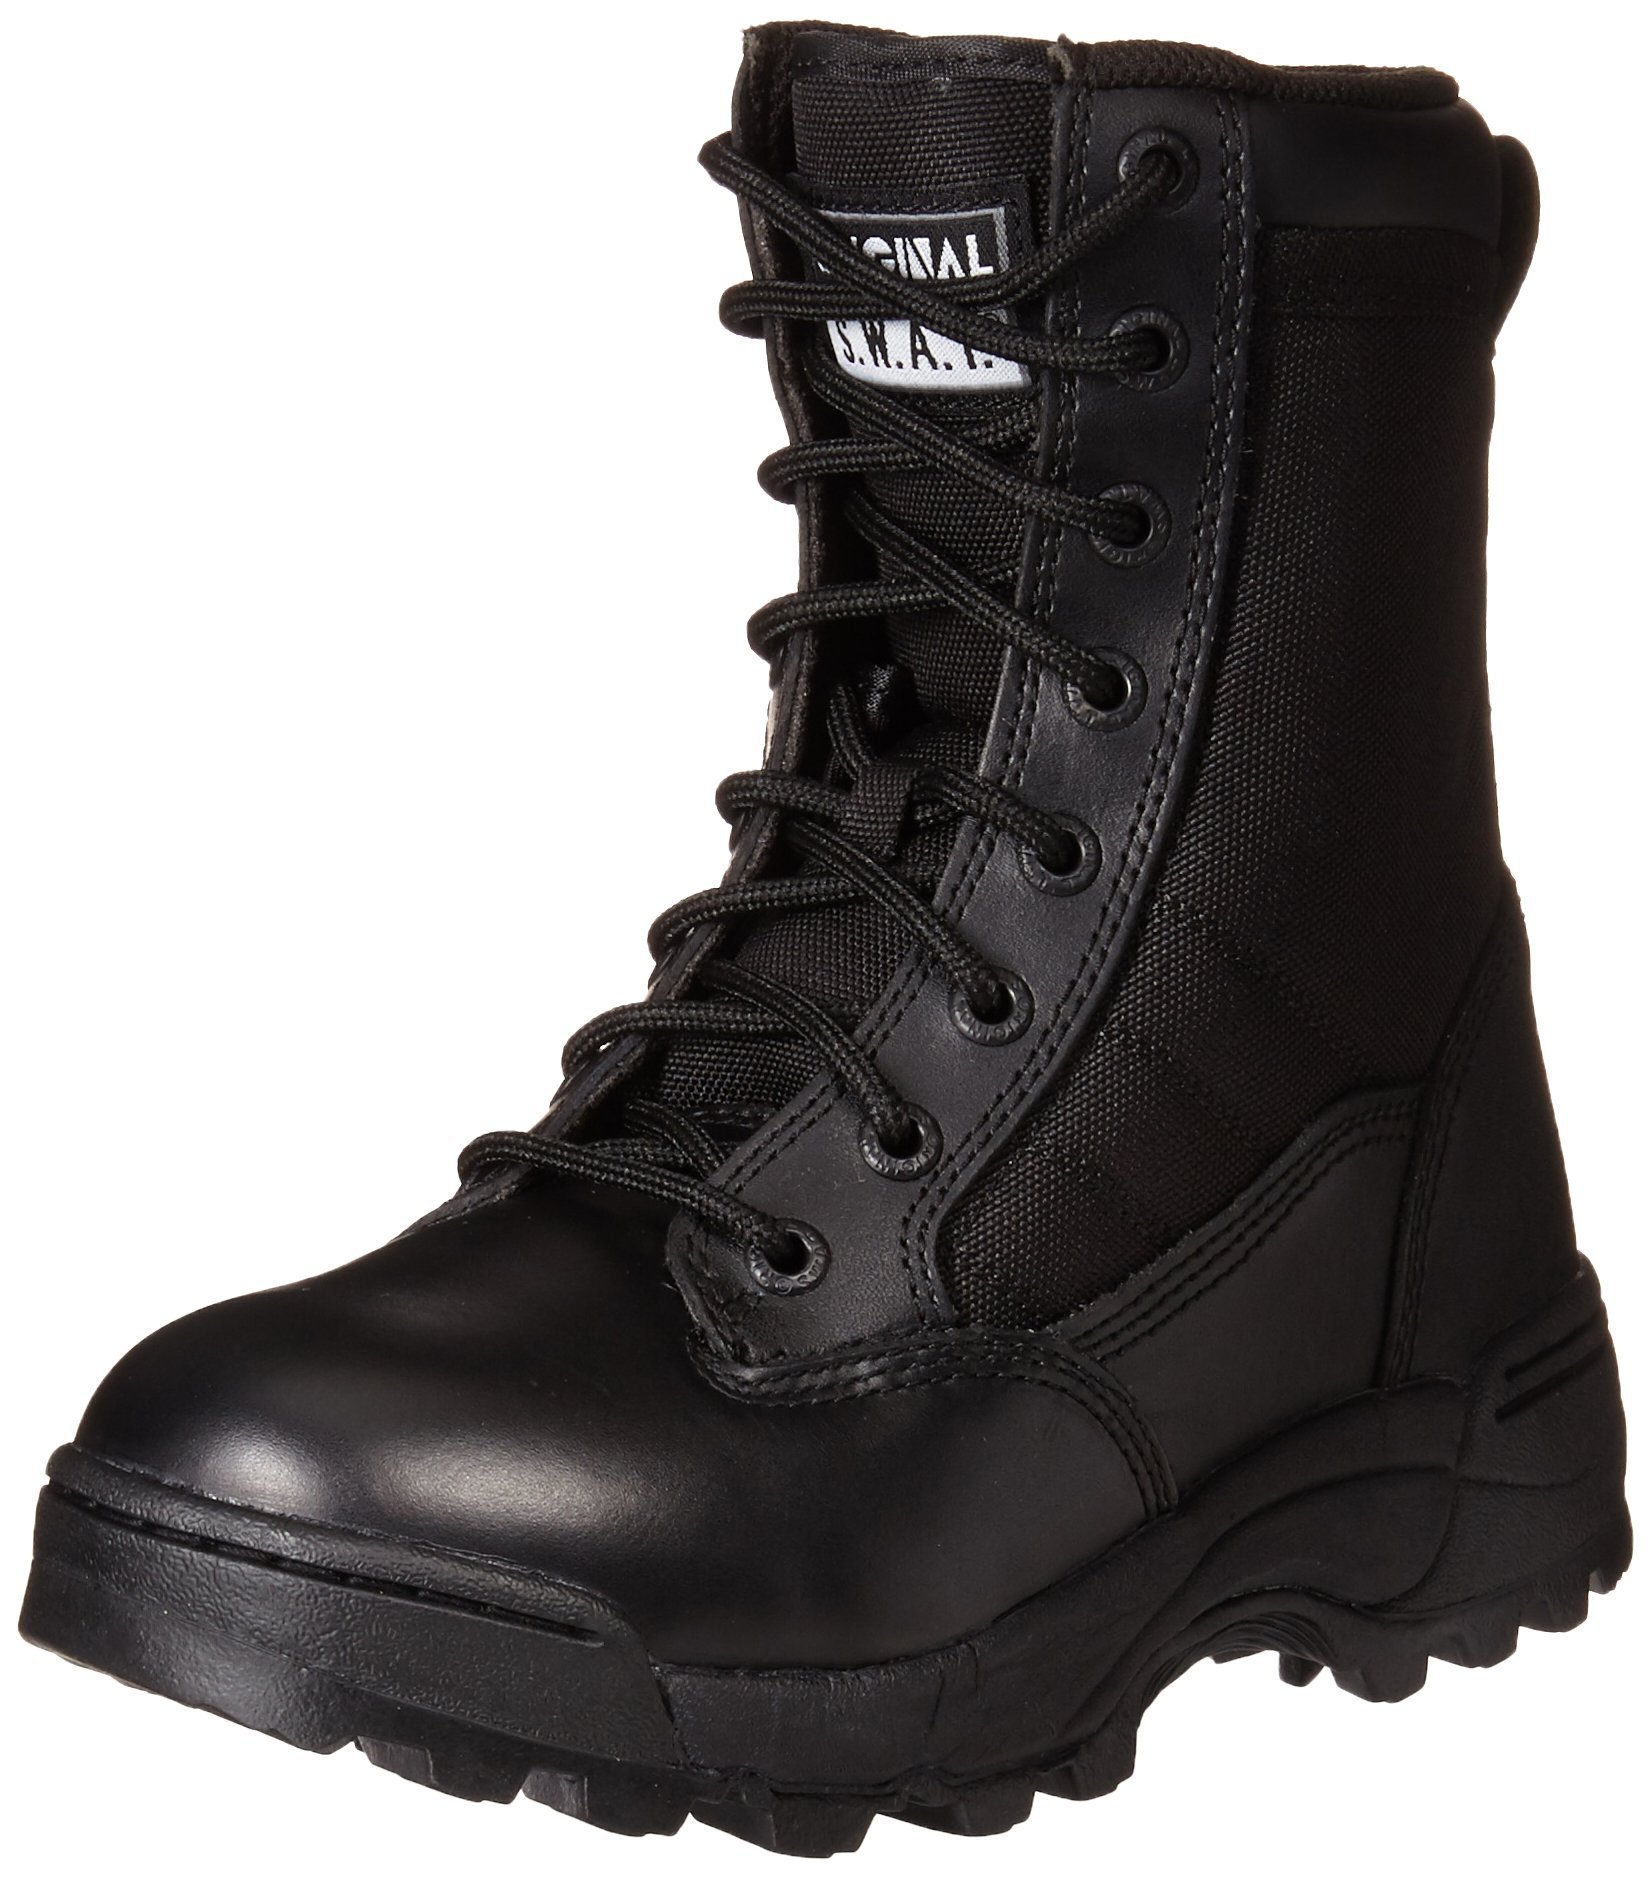 Original S.W.A.T. Women's Classic 9 Inch Tactical Boot